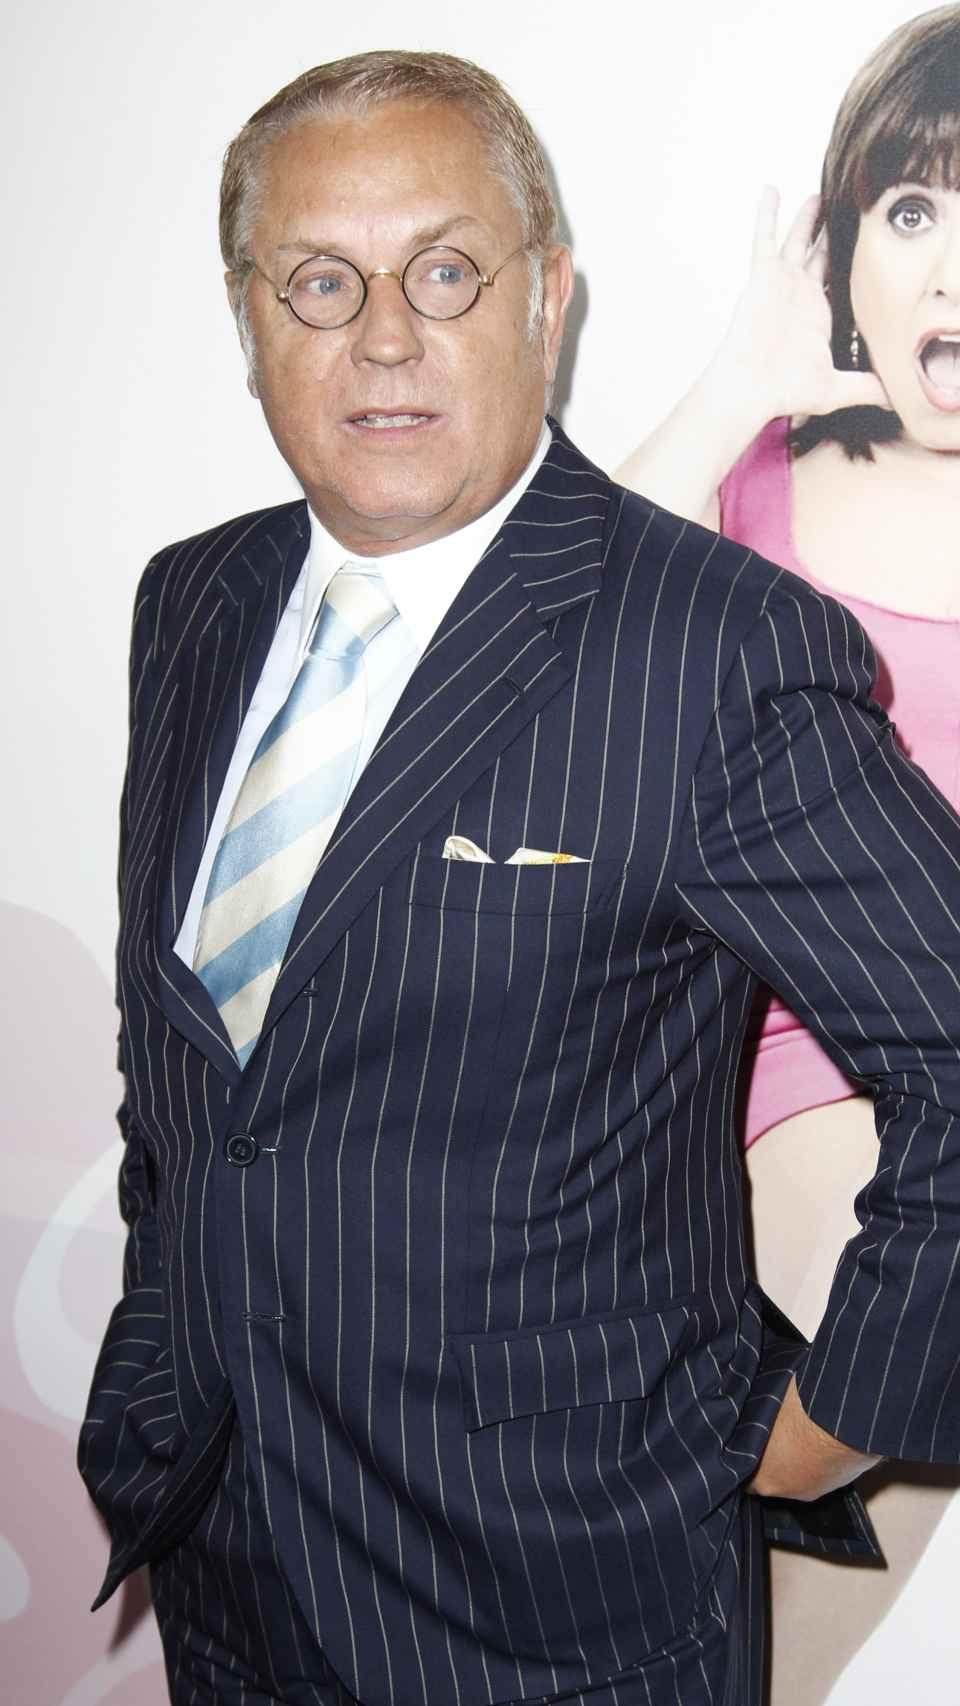 El abogado Javier Saavedra.